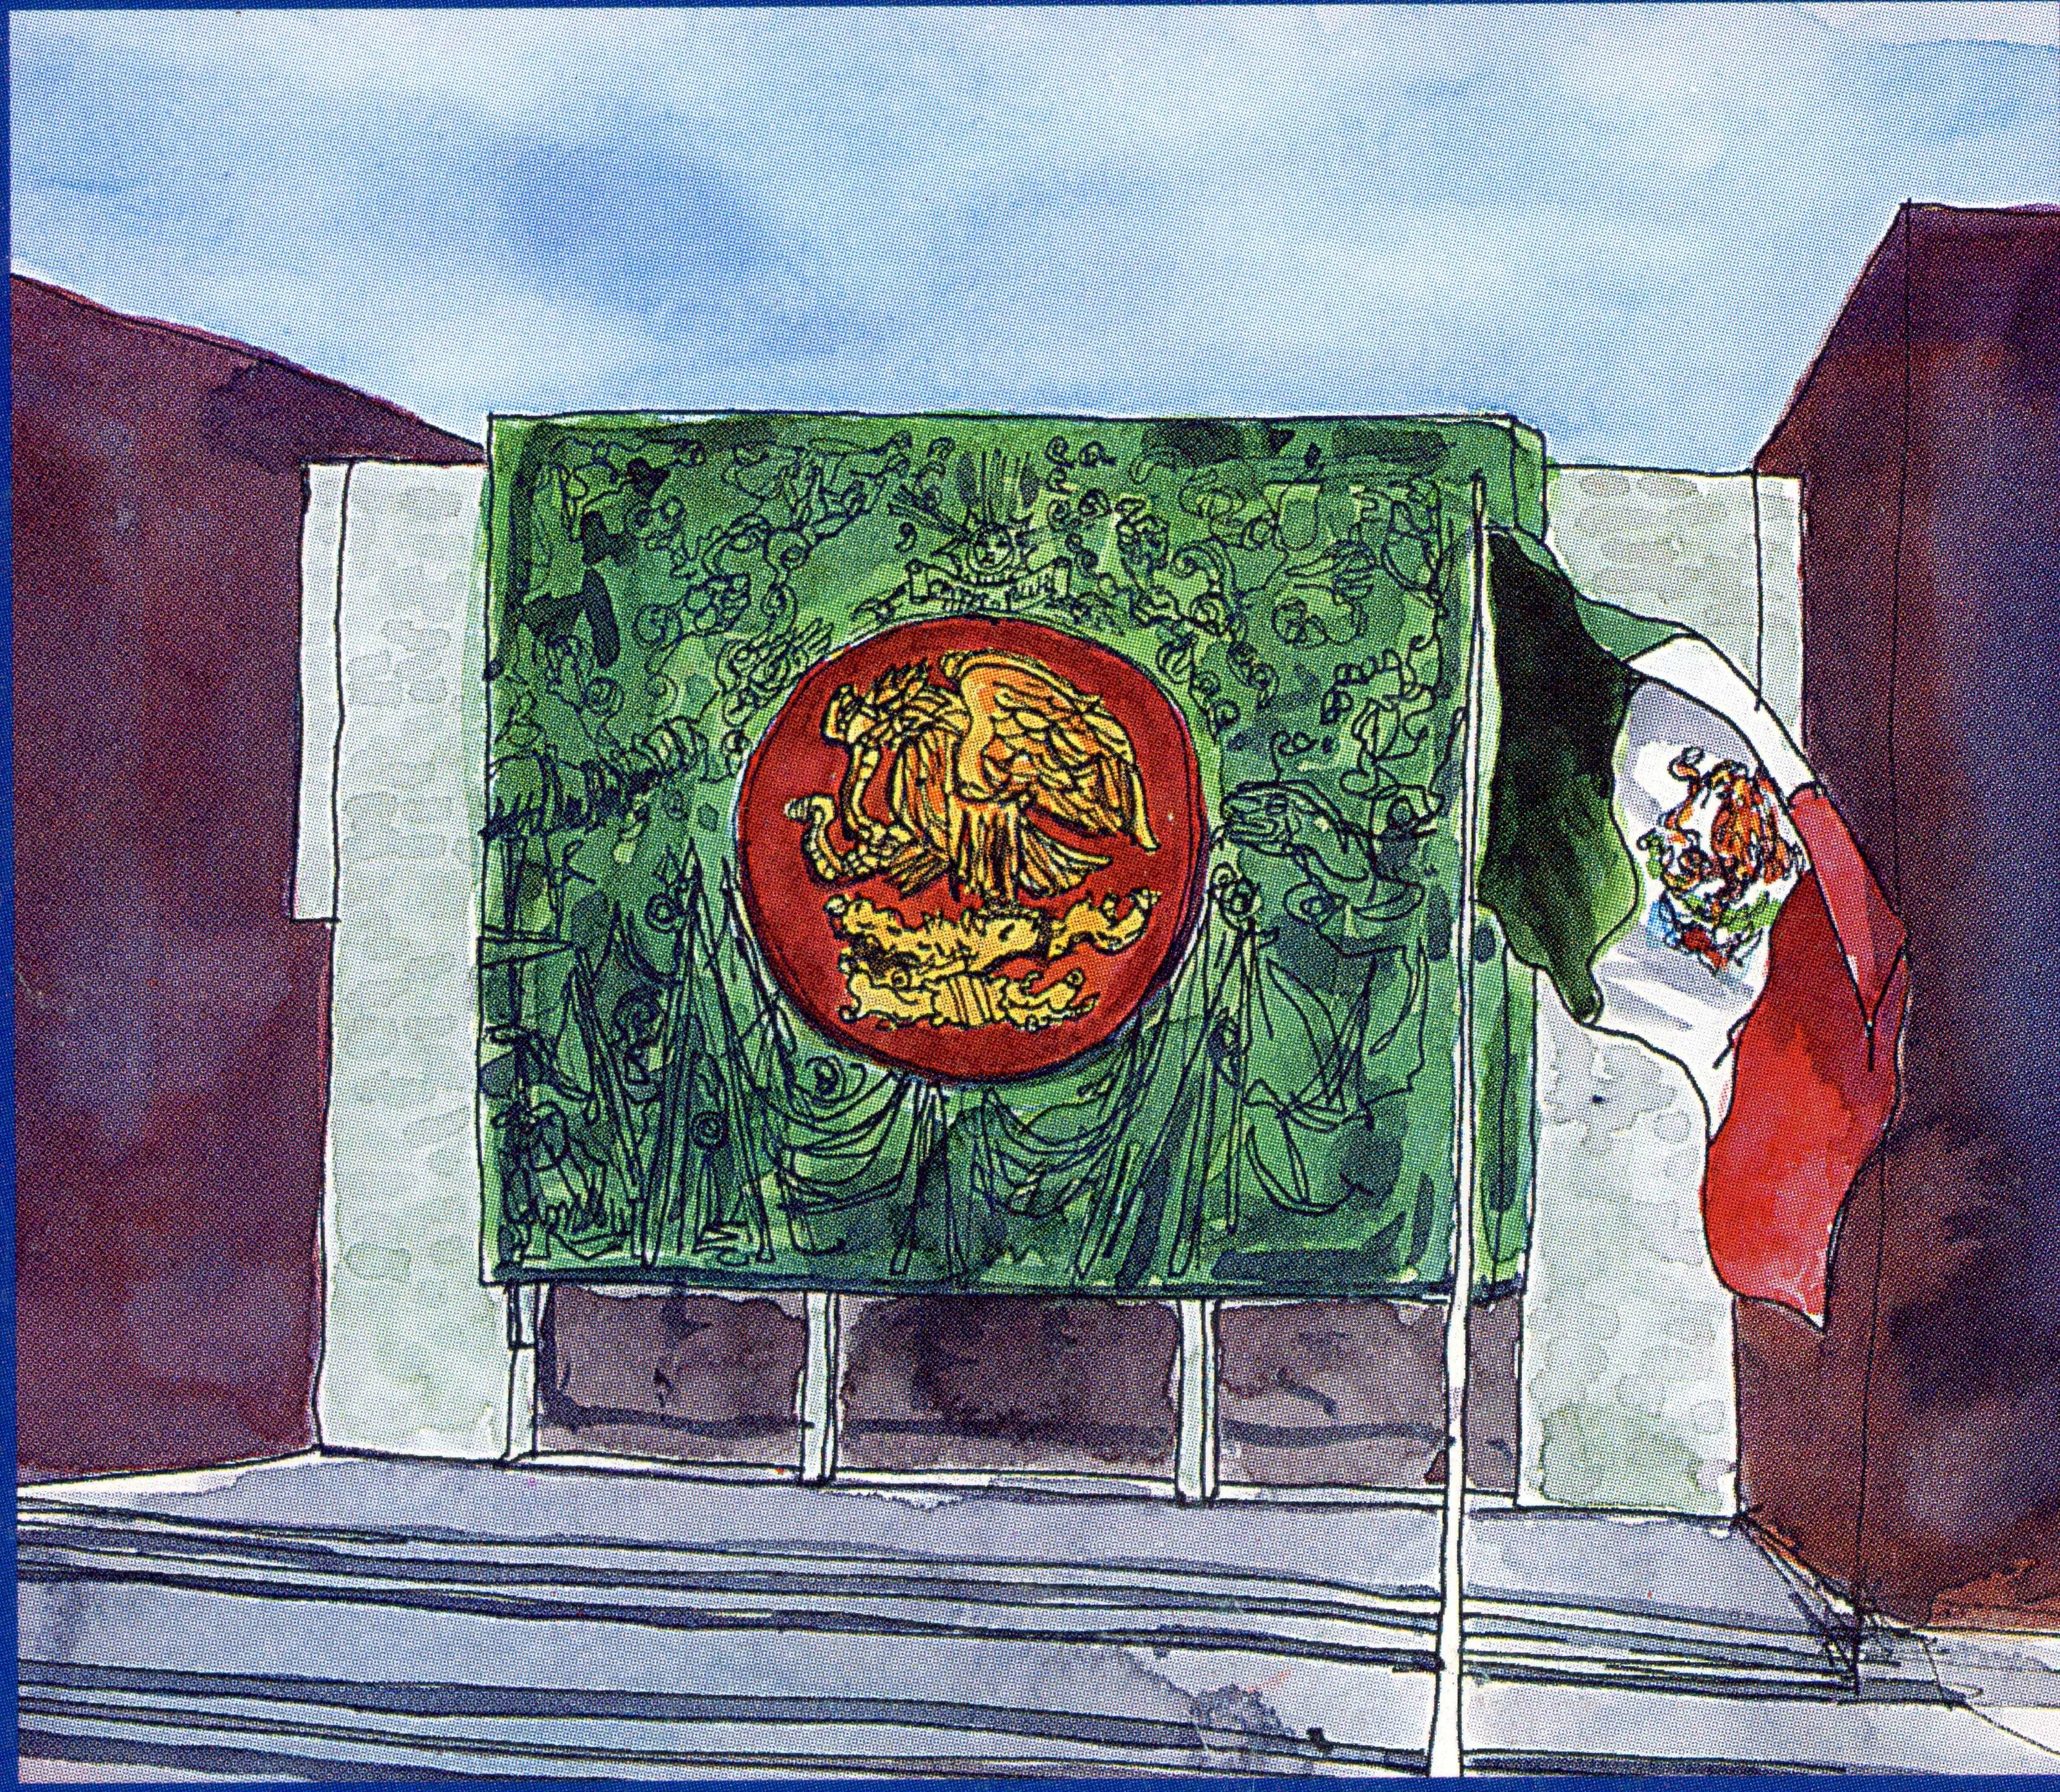 Pintura De La Camara De Diputados Edificios Diputados Camas